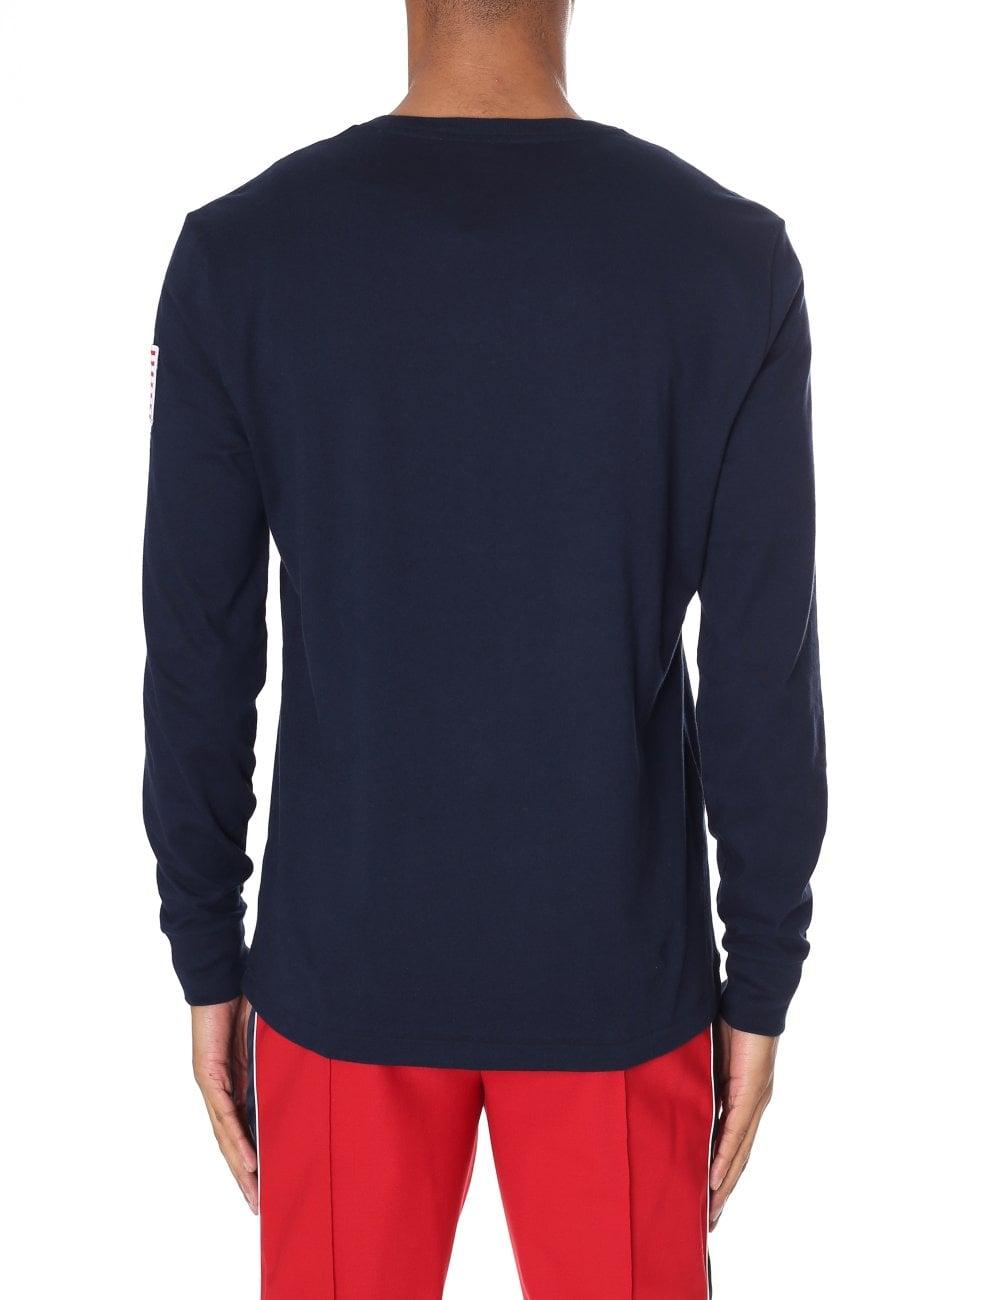 60f0d3336295 Polo Ralph Lauren Men's Custom Slim Fit Long Sleeve Tee